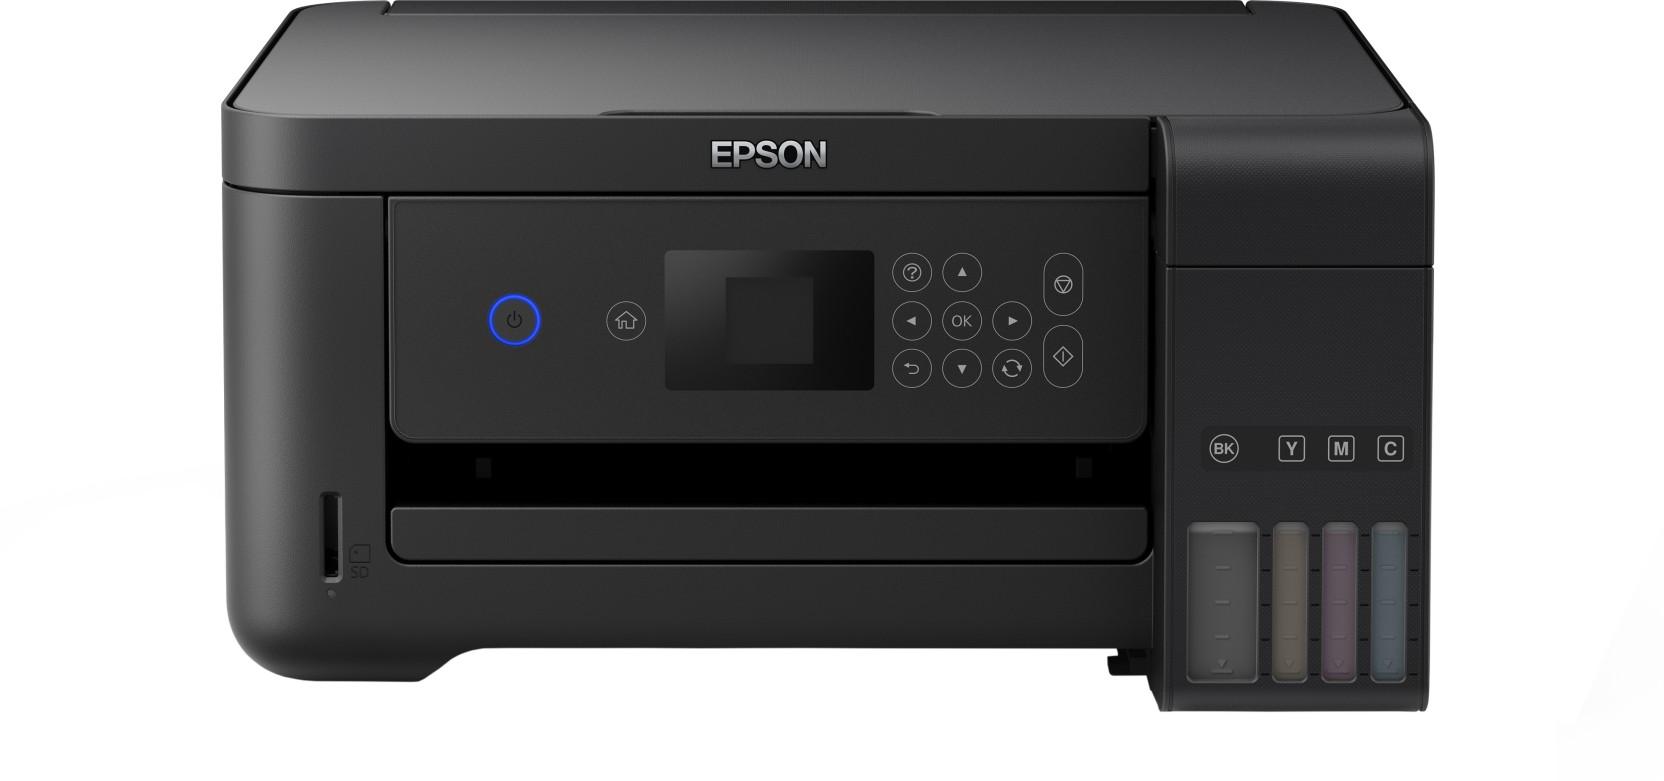 Epson L4160 Multi Function Wireless Printer Mainboard L805 Wifi Add To Cart